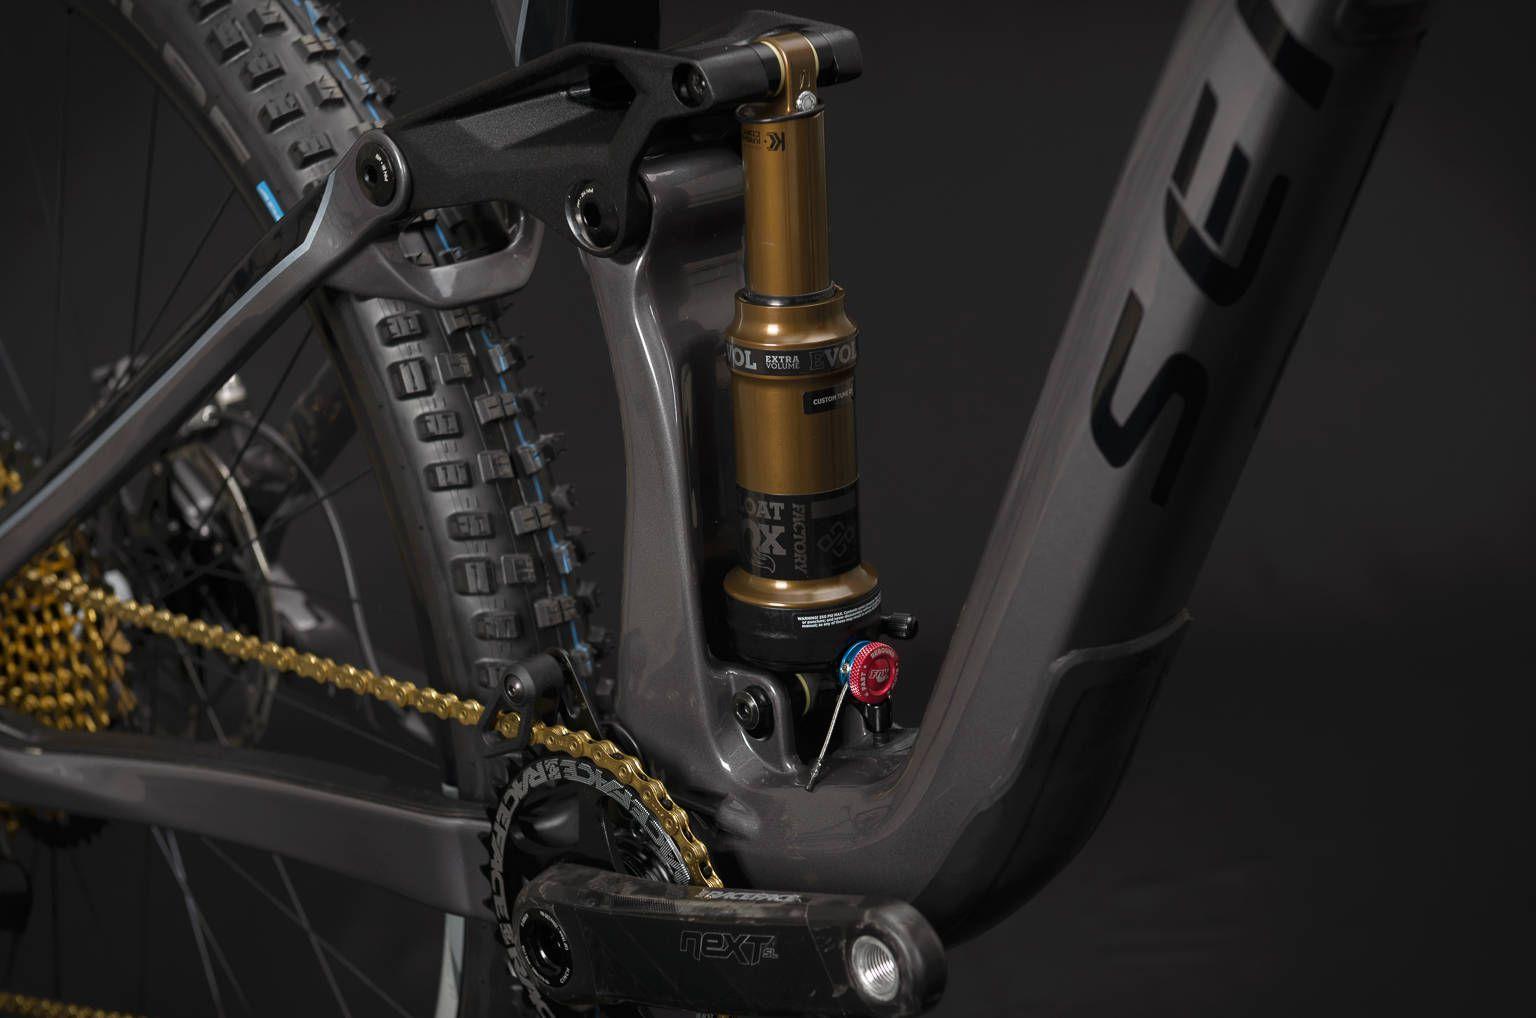 Bicicleta SENSE Exalt Factory 2020 - 12v Sram XX1 Eagle - Chumbo